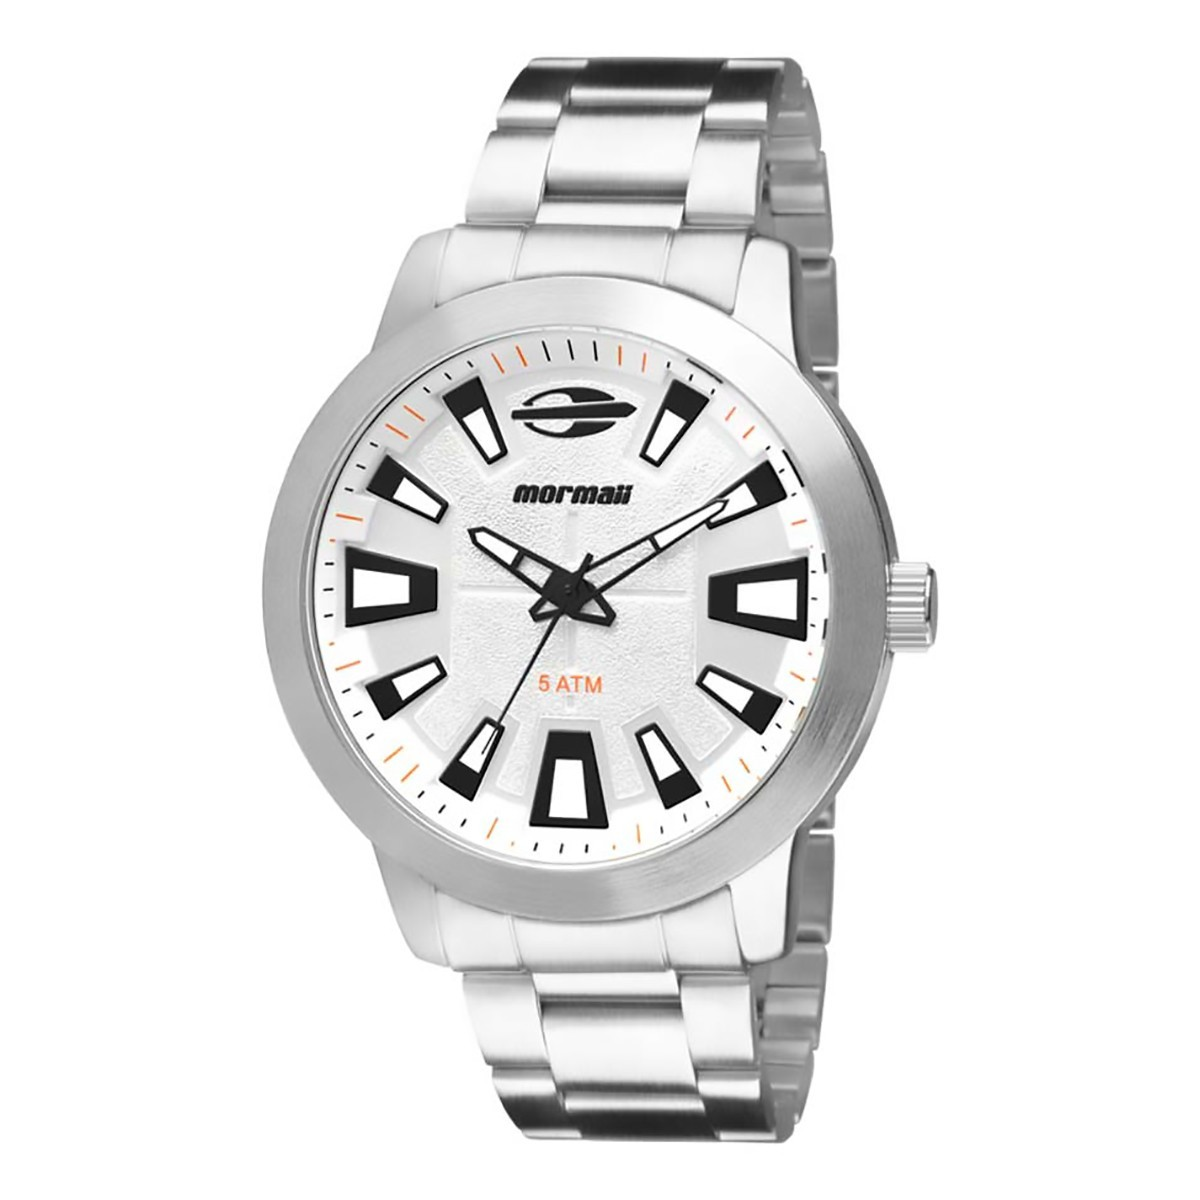 Relógio Mormaii Masculino - MO2035CZ/3A